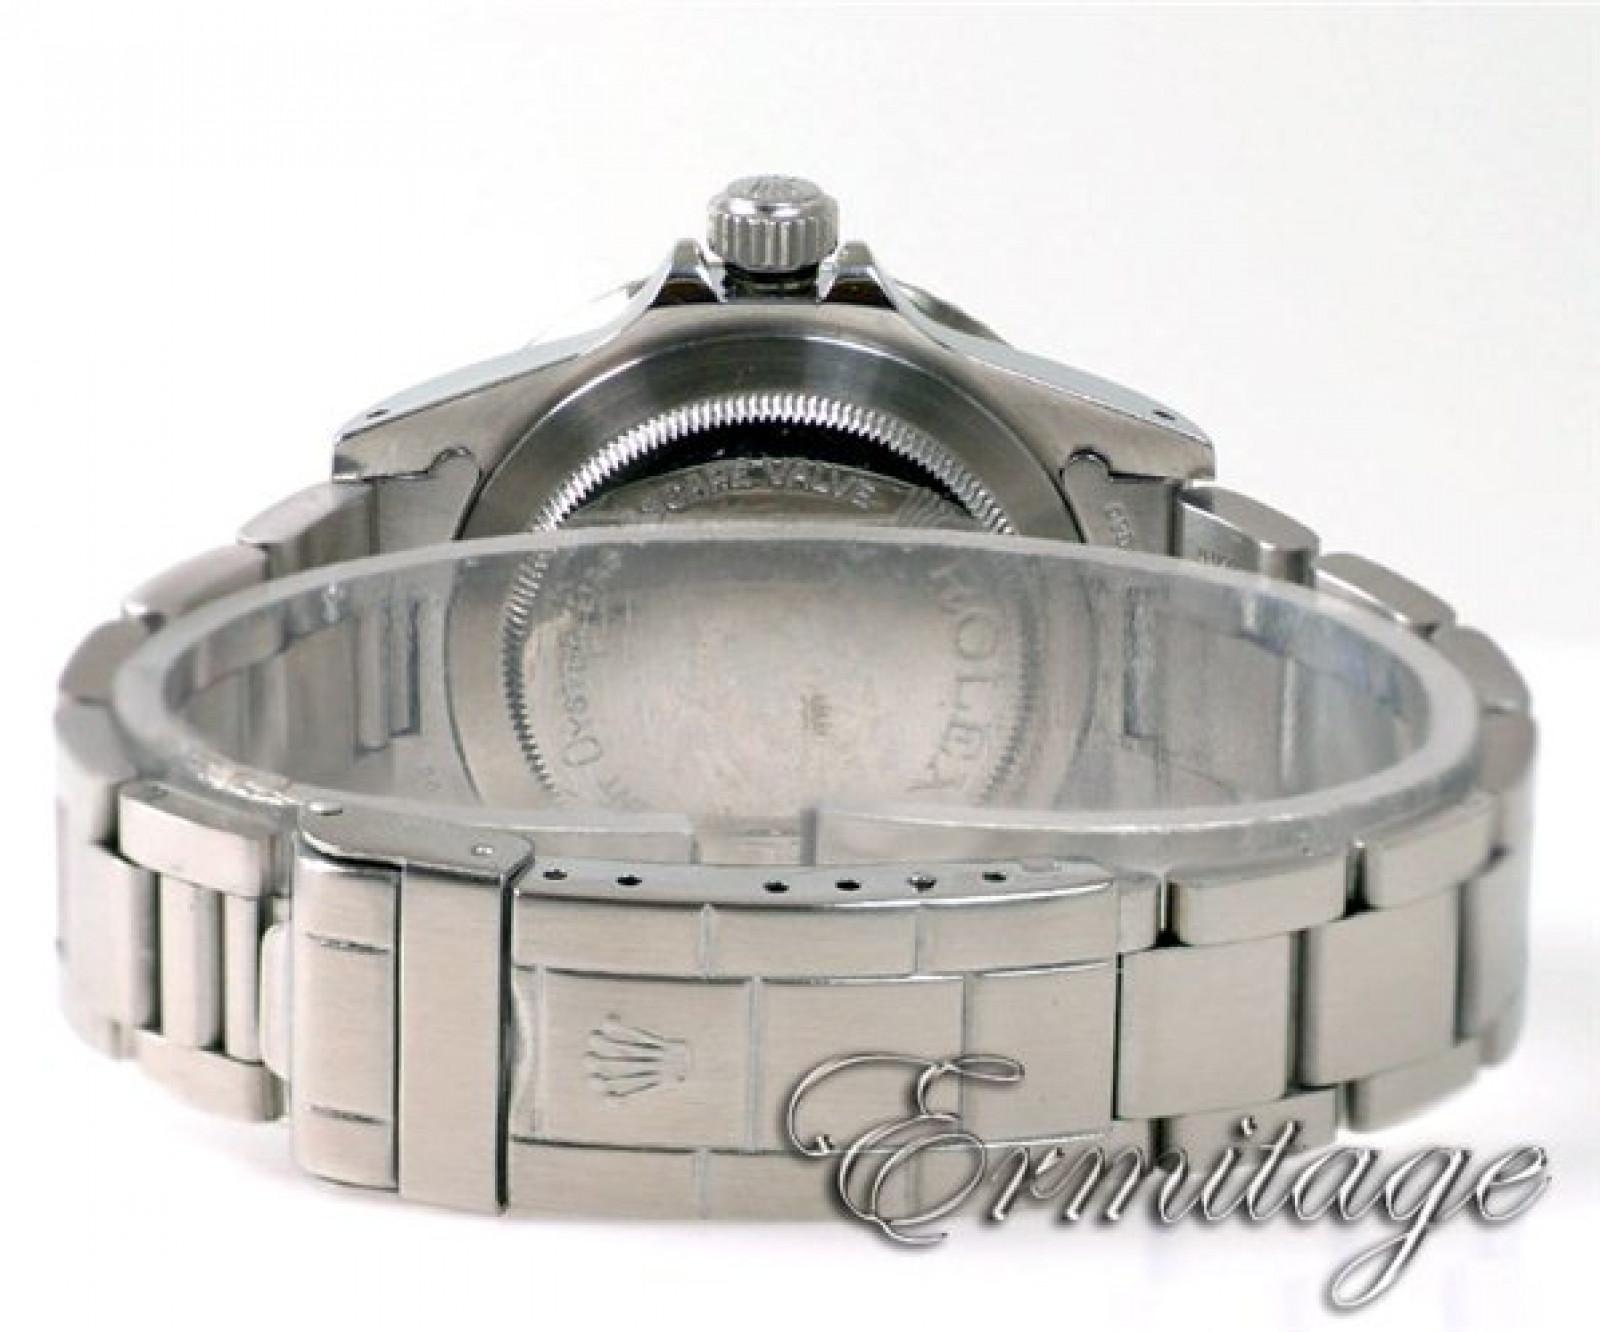 Vintage Rolex Sea-Dweller 1665 Steel 1983